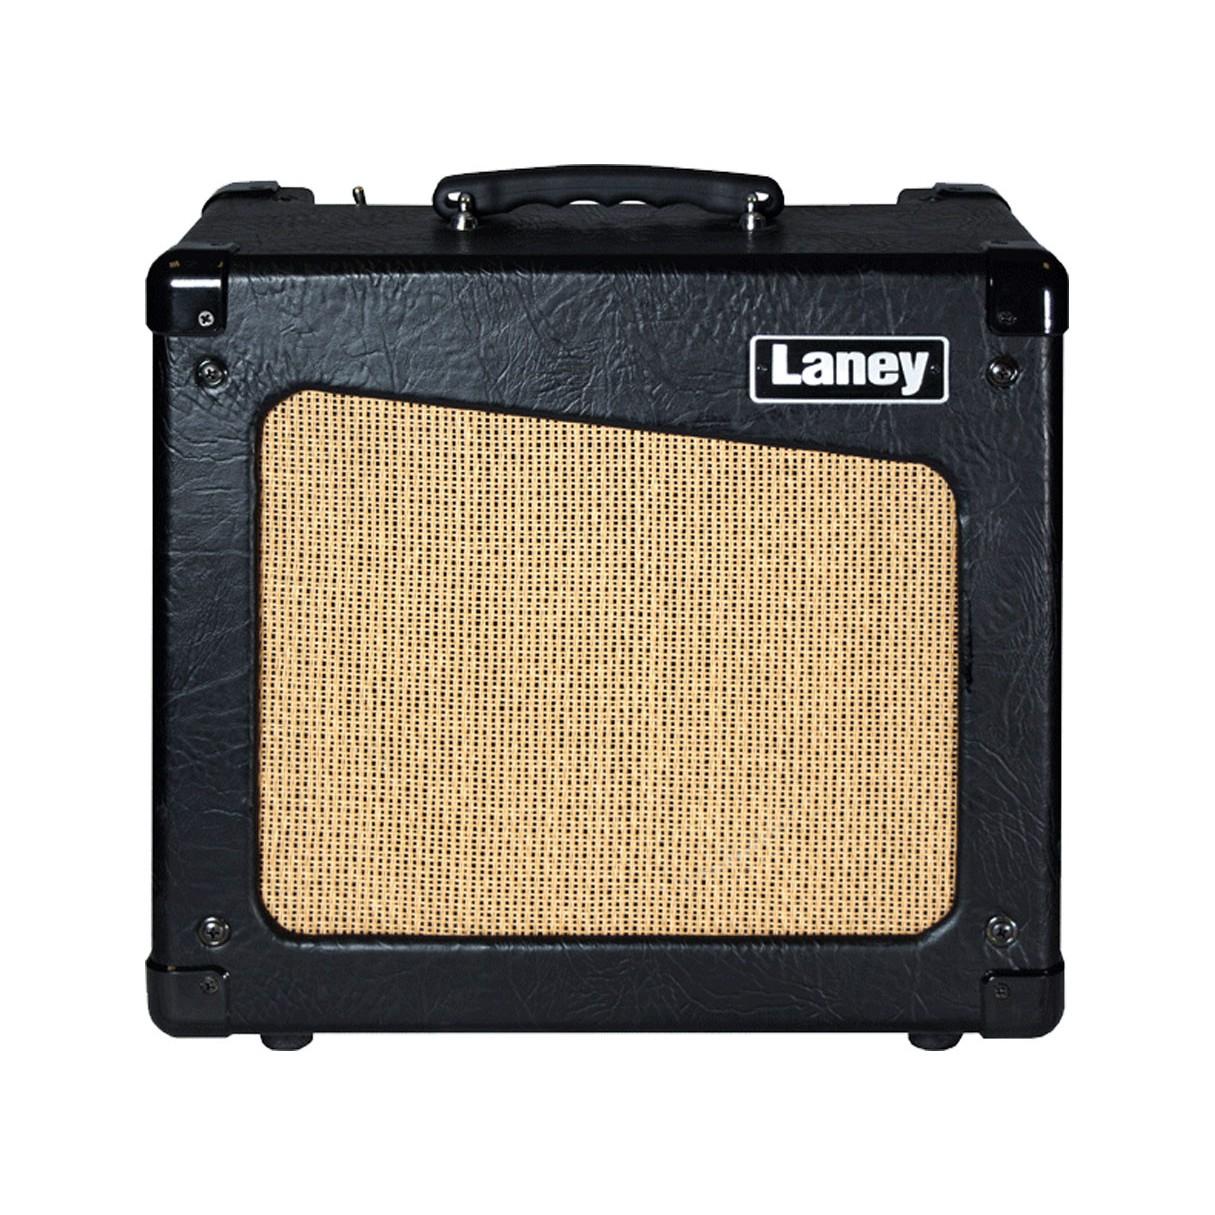 laney cub12 1x12 tube combo amp. Black Bedroom Furniture Sets. Home Design Ideas